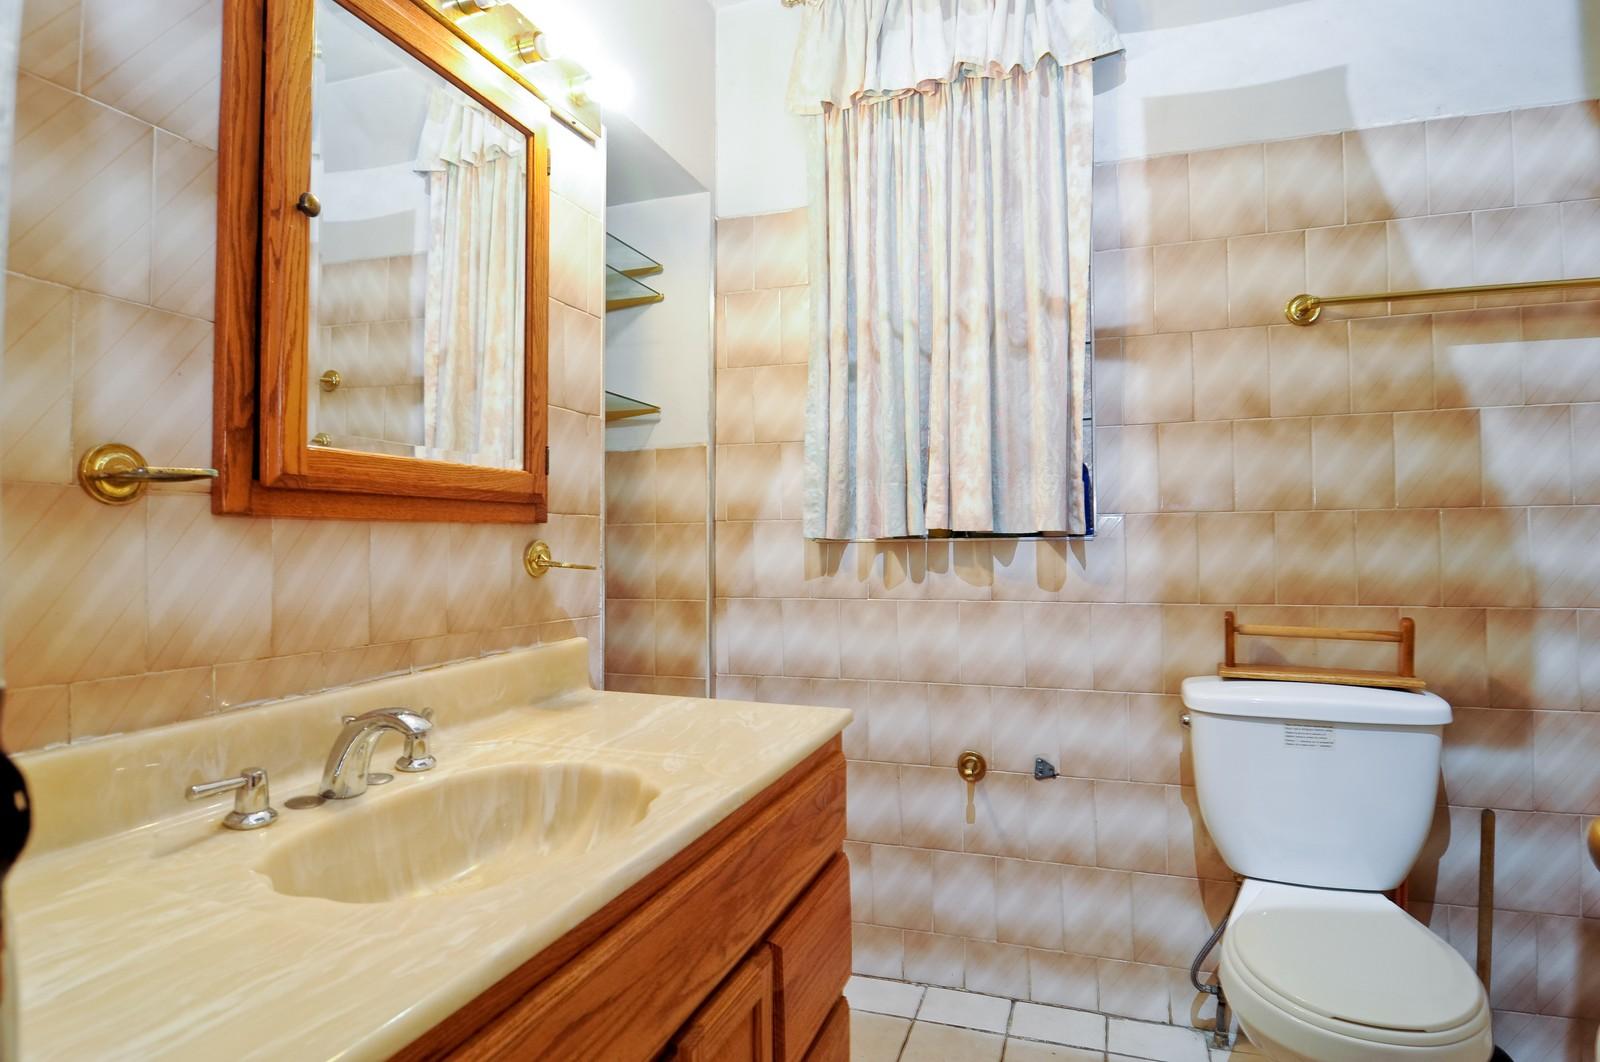 Real Estate Photography - 4419 W Jackson, Chicago, IL, 60624 - Bathroom